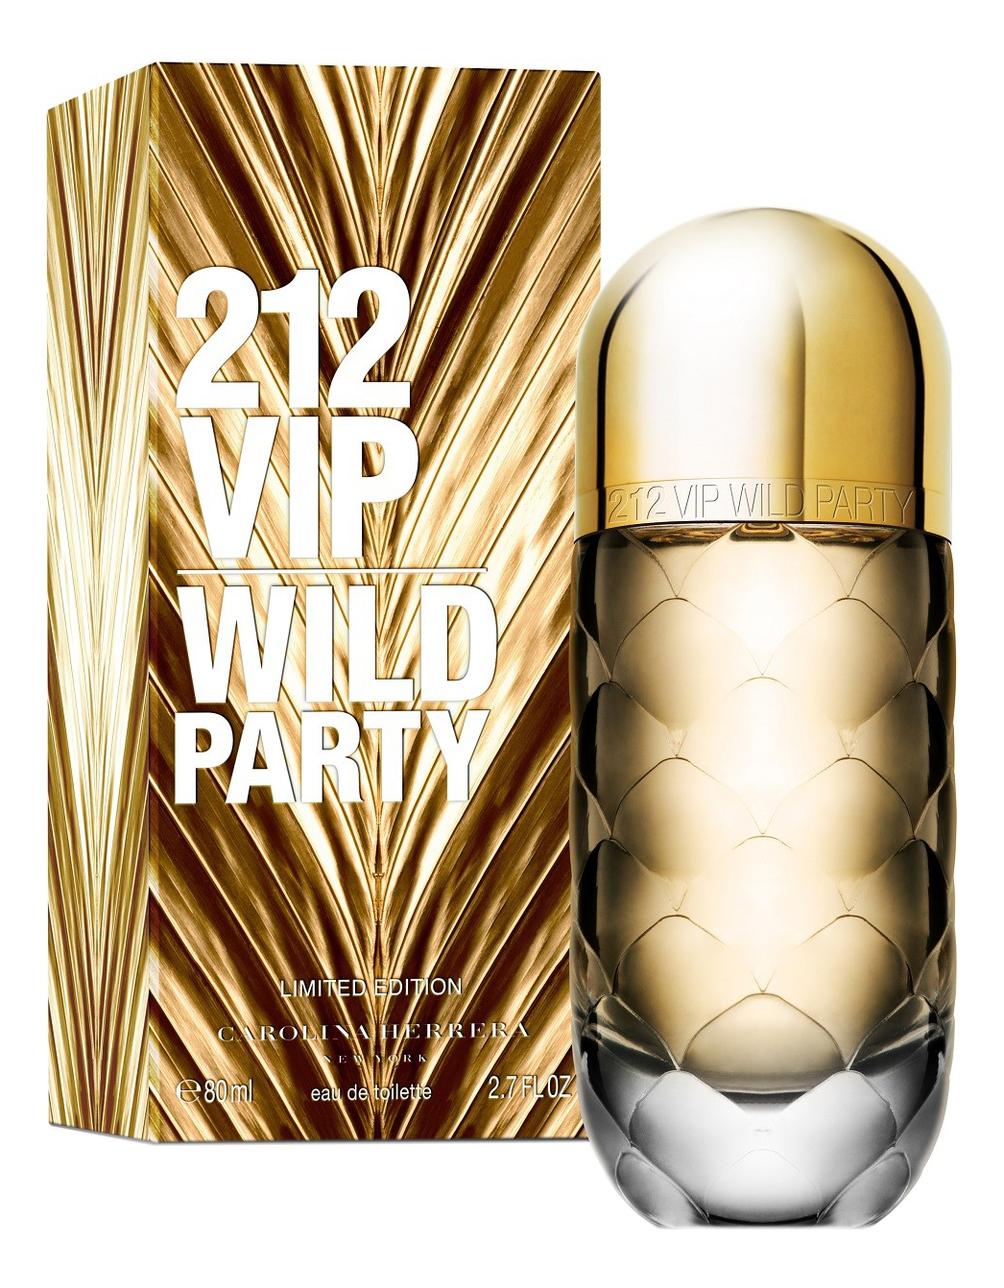 Carolina Herrera 212 VIP Wild Party: туалетная вода 80мл 212 vip edp 30 мл carolina herrera